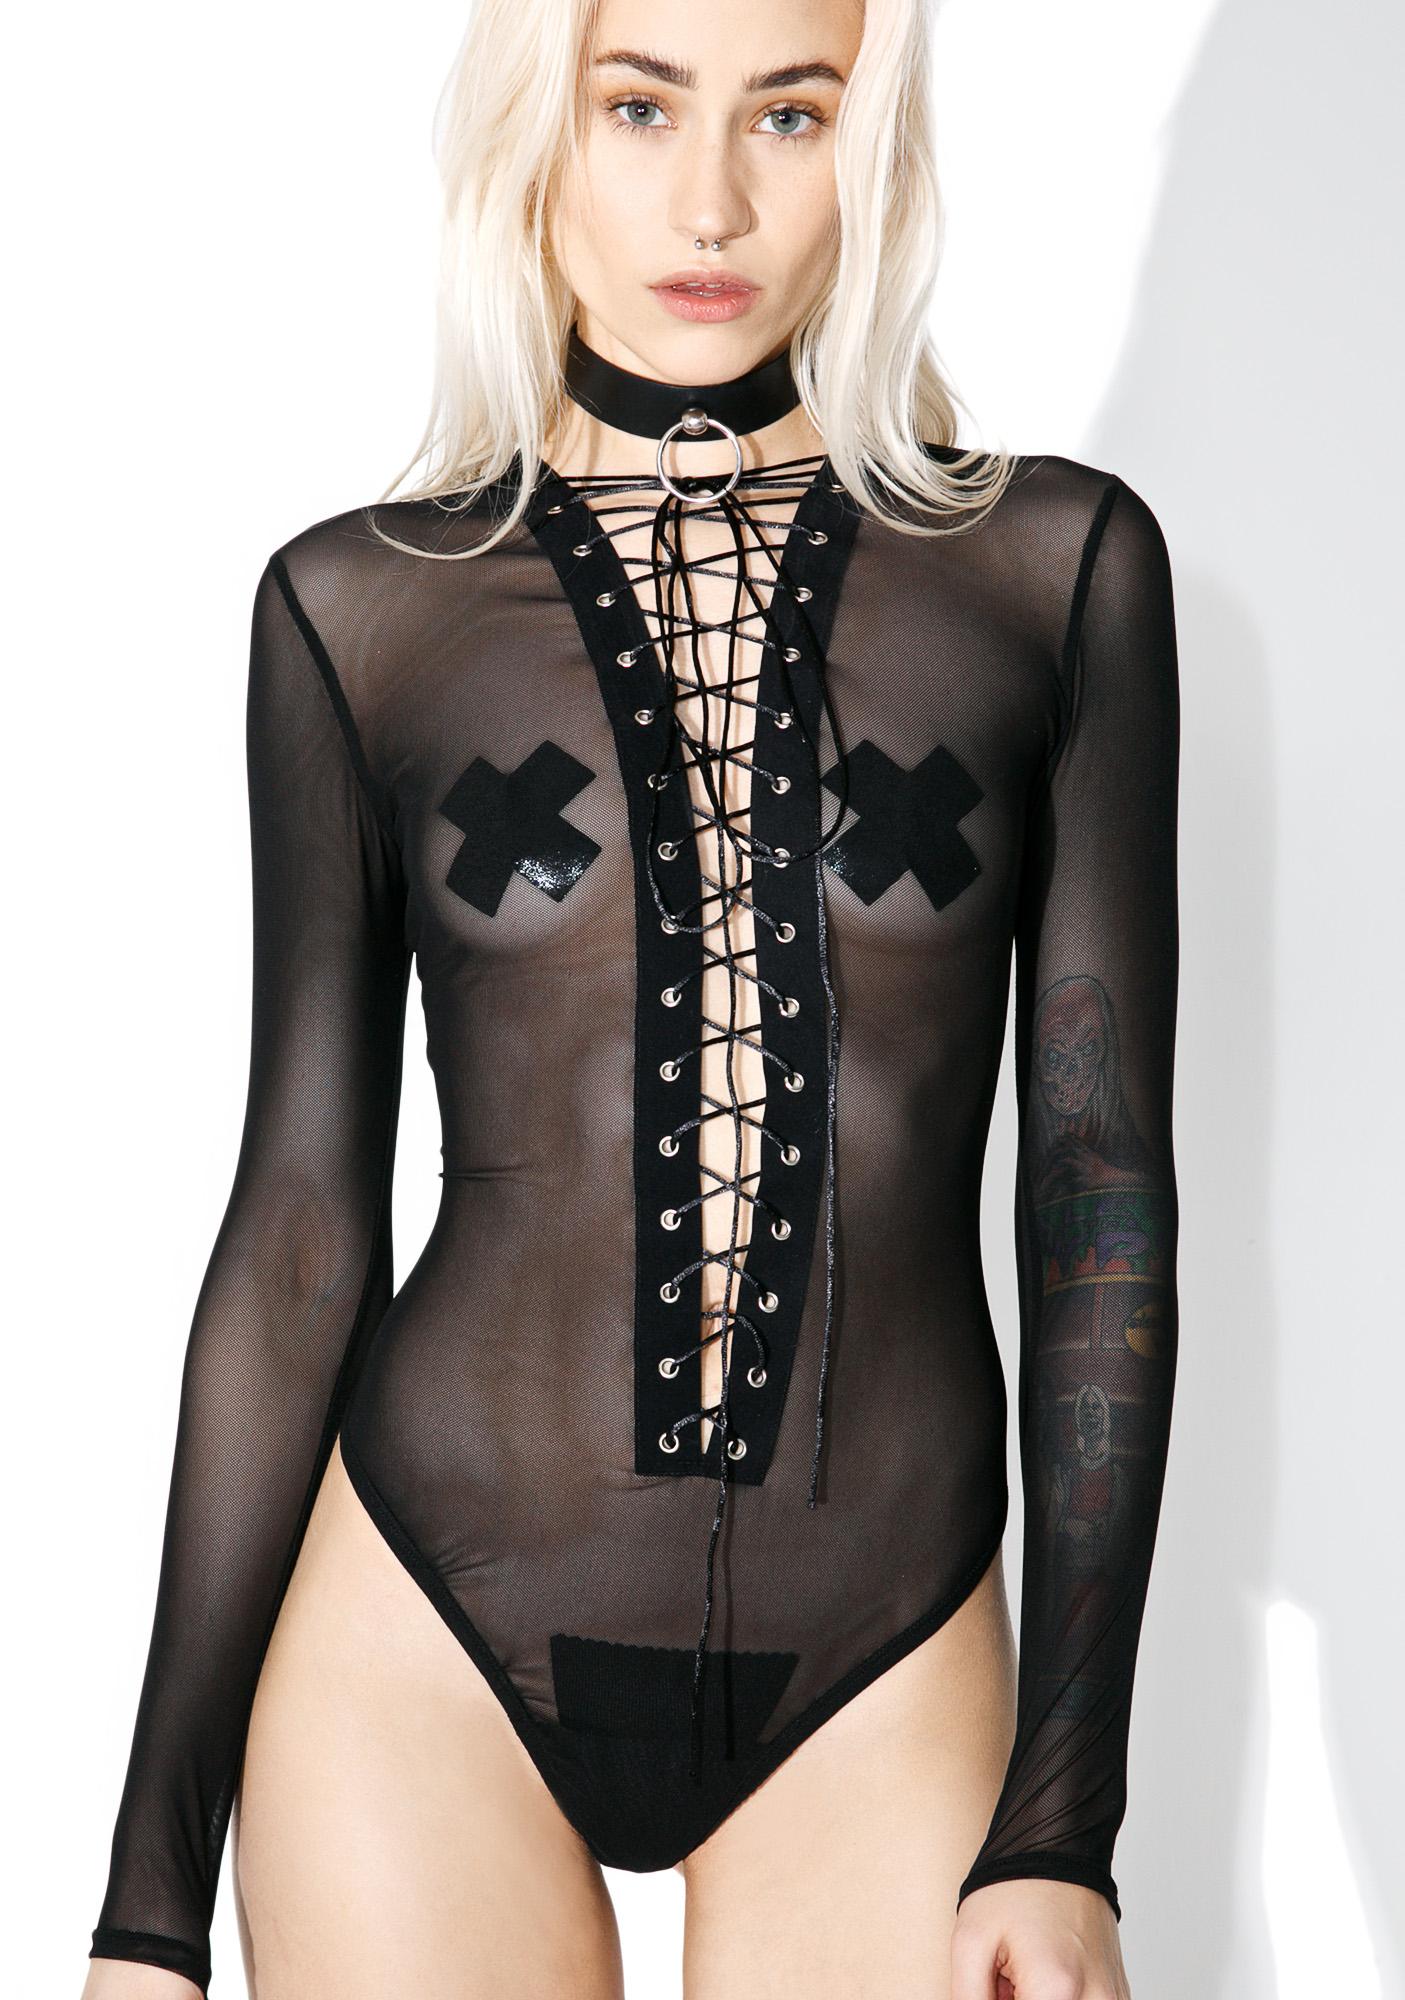 Black Sheer Long Sleeve Lace Up Bodysuit